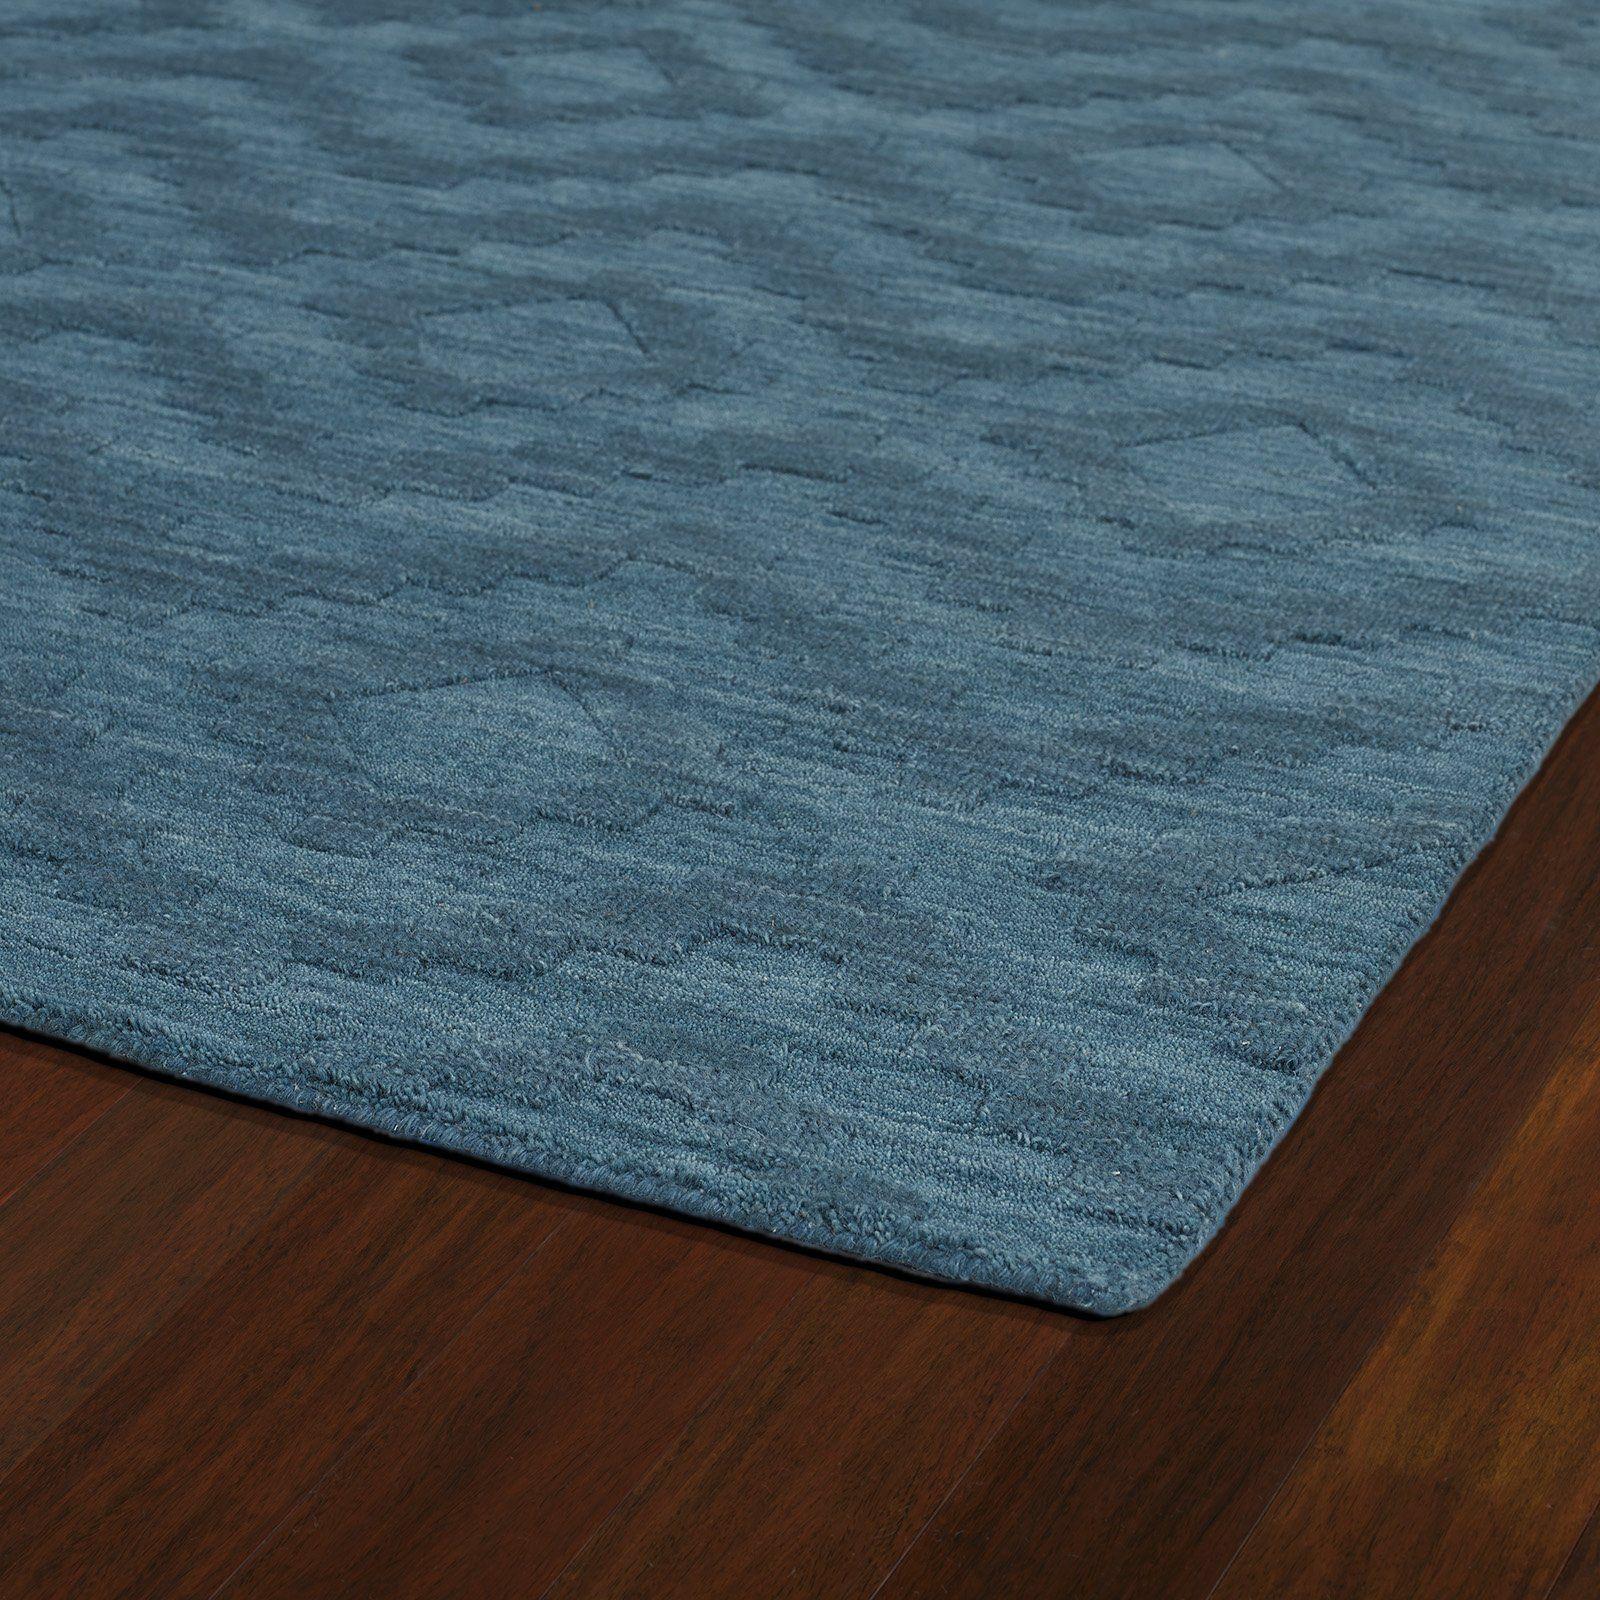 Ebern Designs Dobson Tufted Turquoise Geometric Area Rug Turquoise Rug Modern Wool Rugs Geometric Area Rug